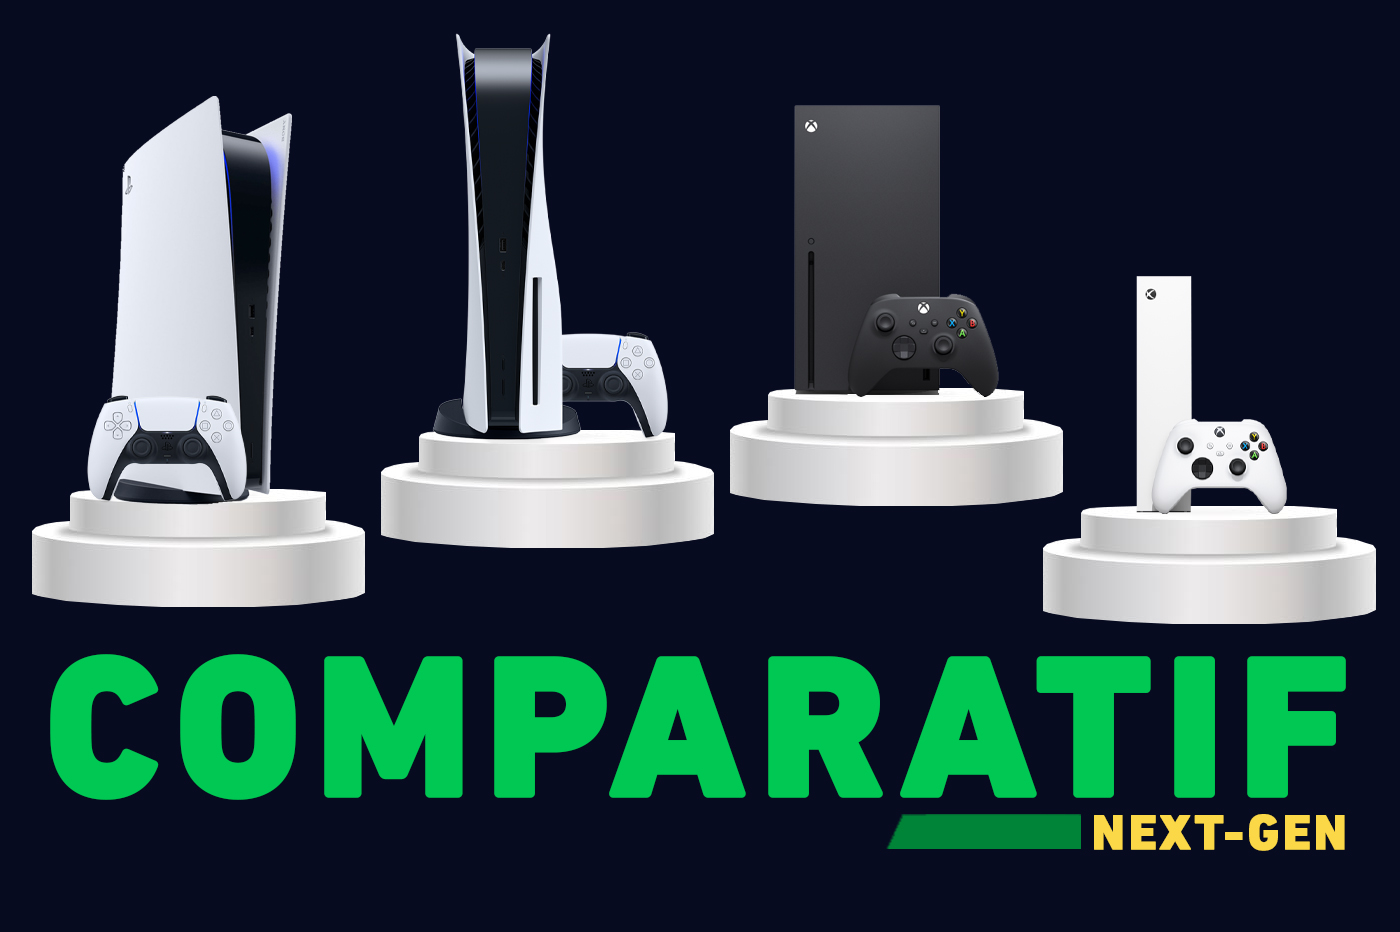 Comparatif Next-Gen PS5 Xbox Series